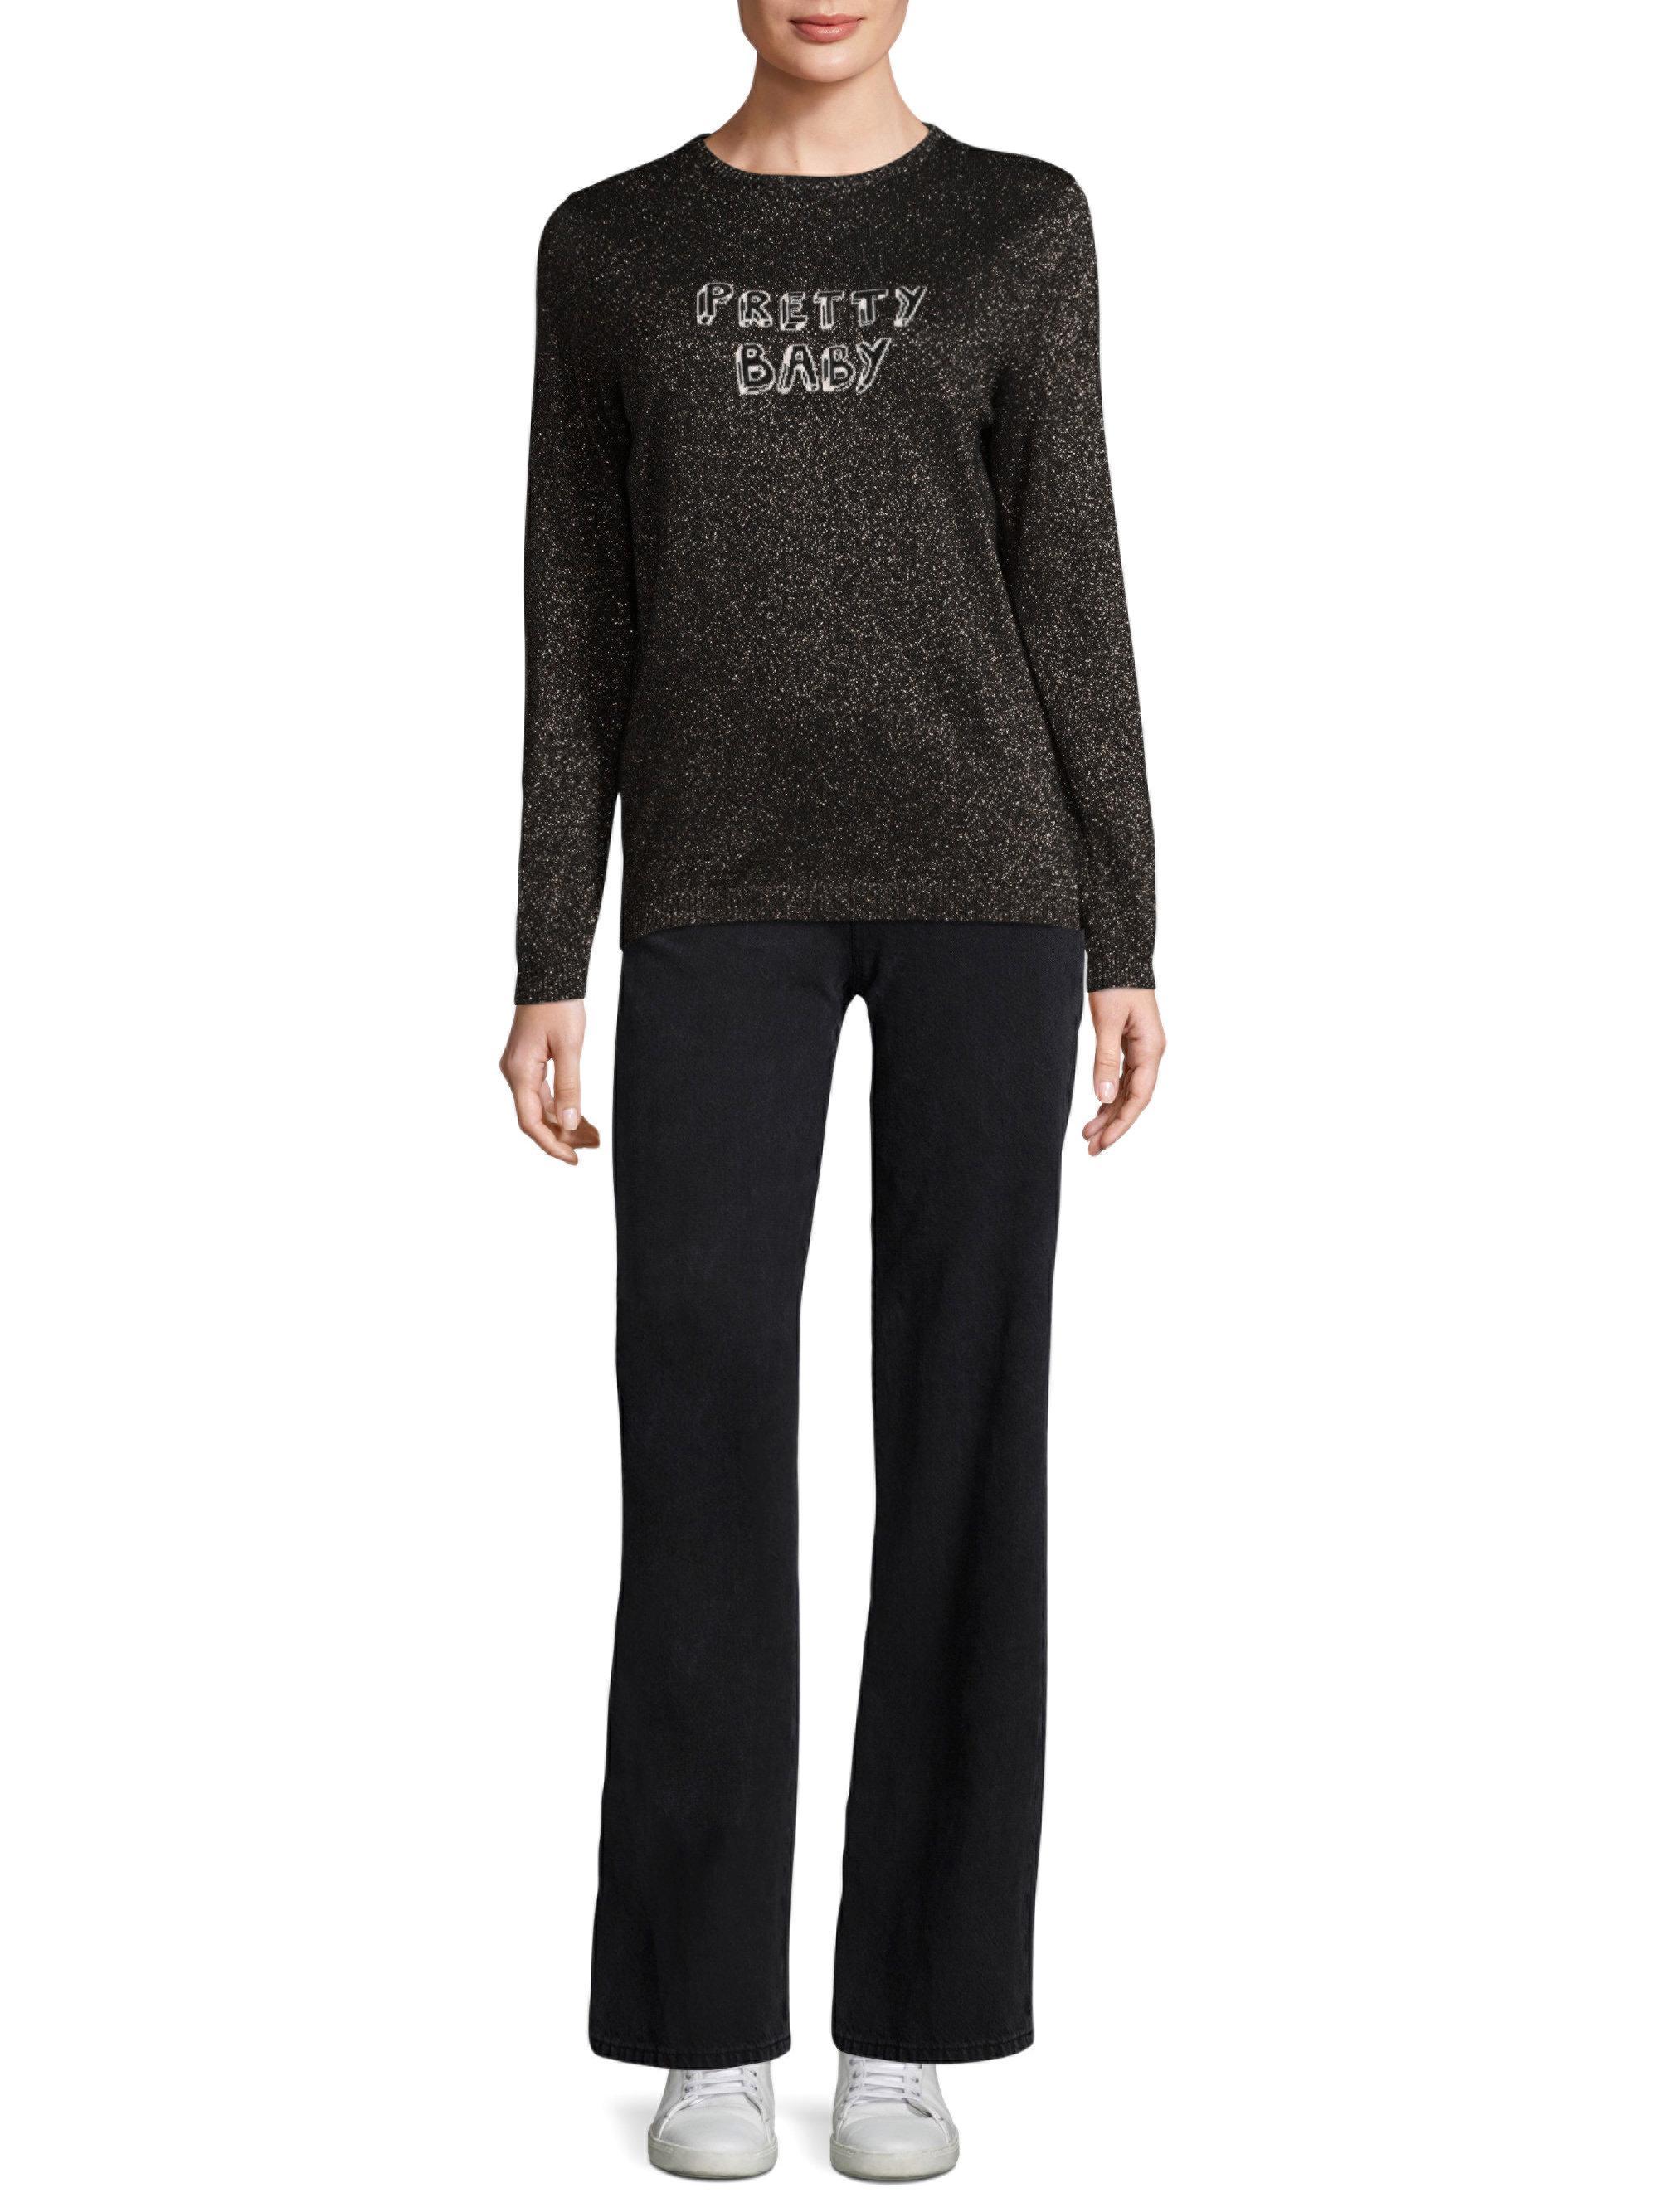 d4136afa3 Lyst - J Brand Bella Freud X Pretty Baby Sweater in Black